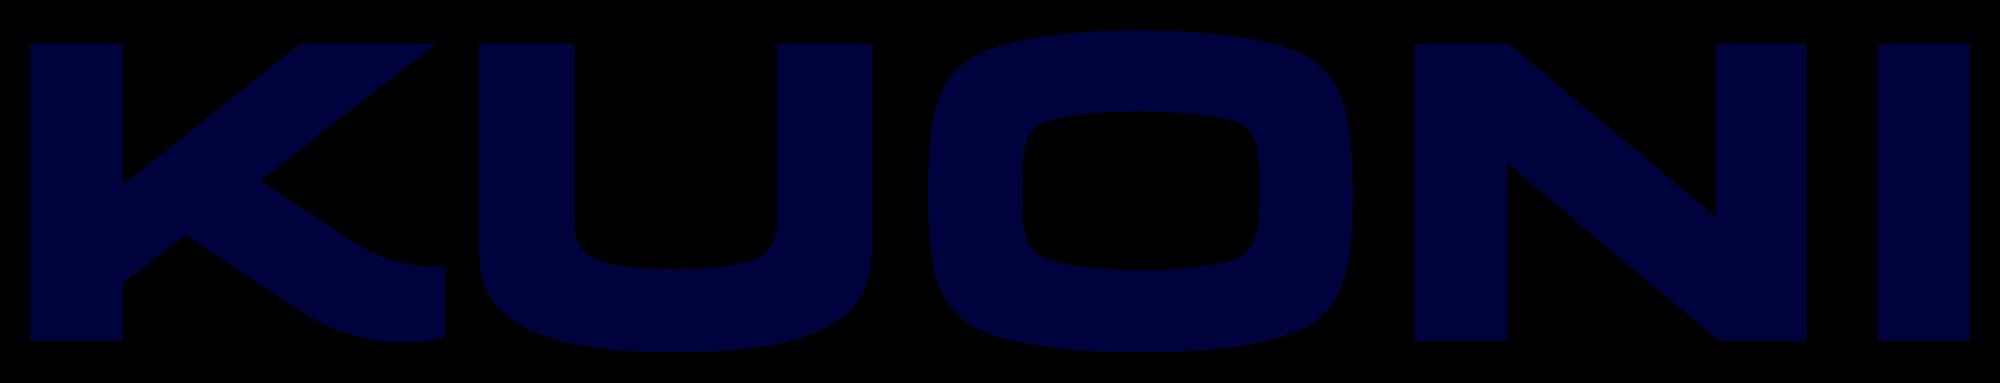 Logo_Kuoni_(2009).svg